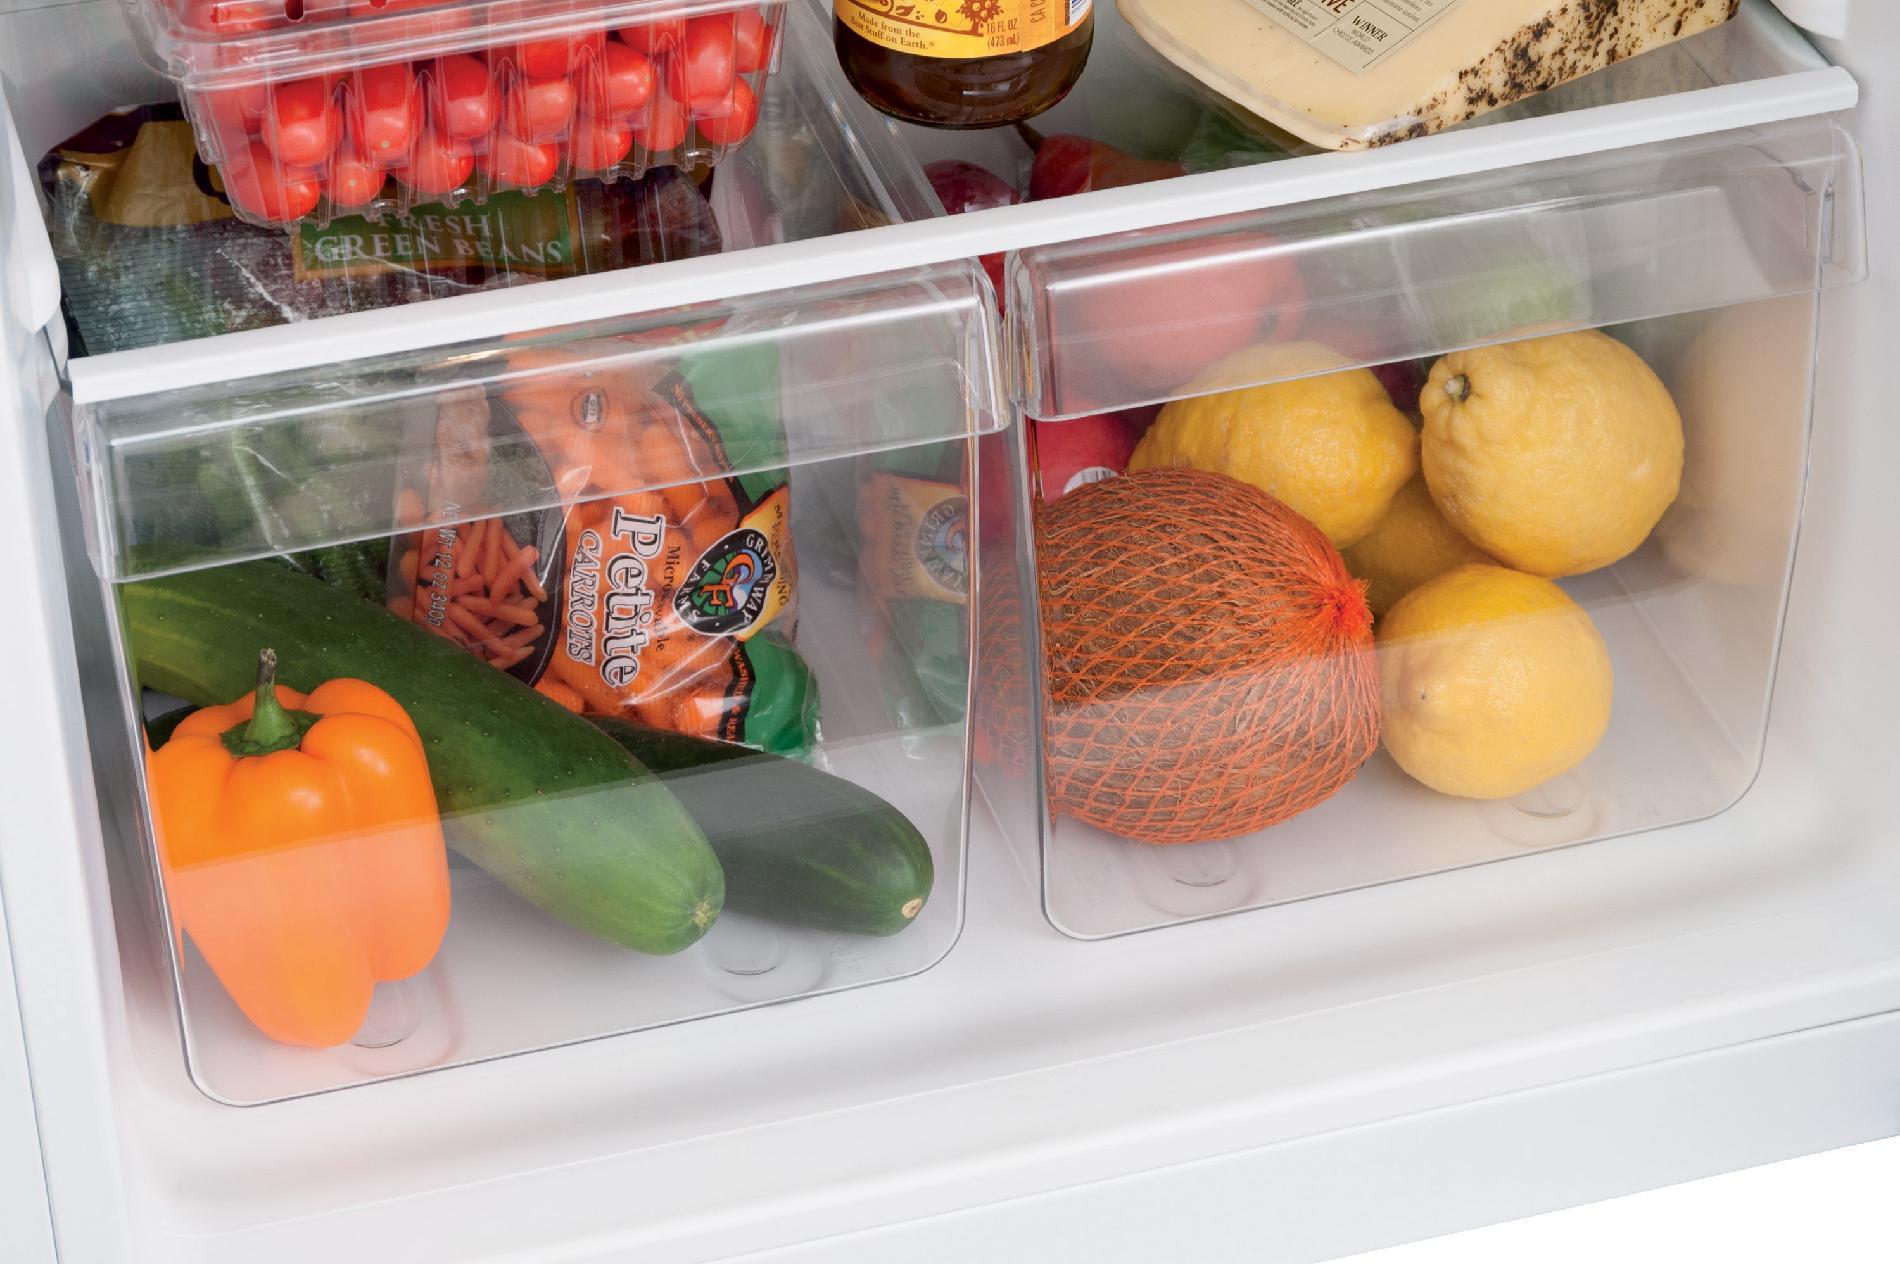 Frigidaire 10.0 cu. ft. Top-Freezer Refrigerator - Silver Mist